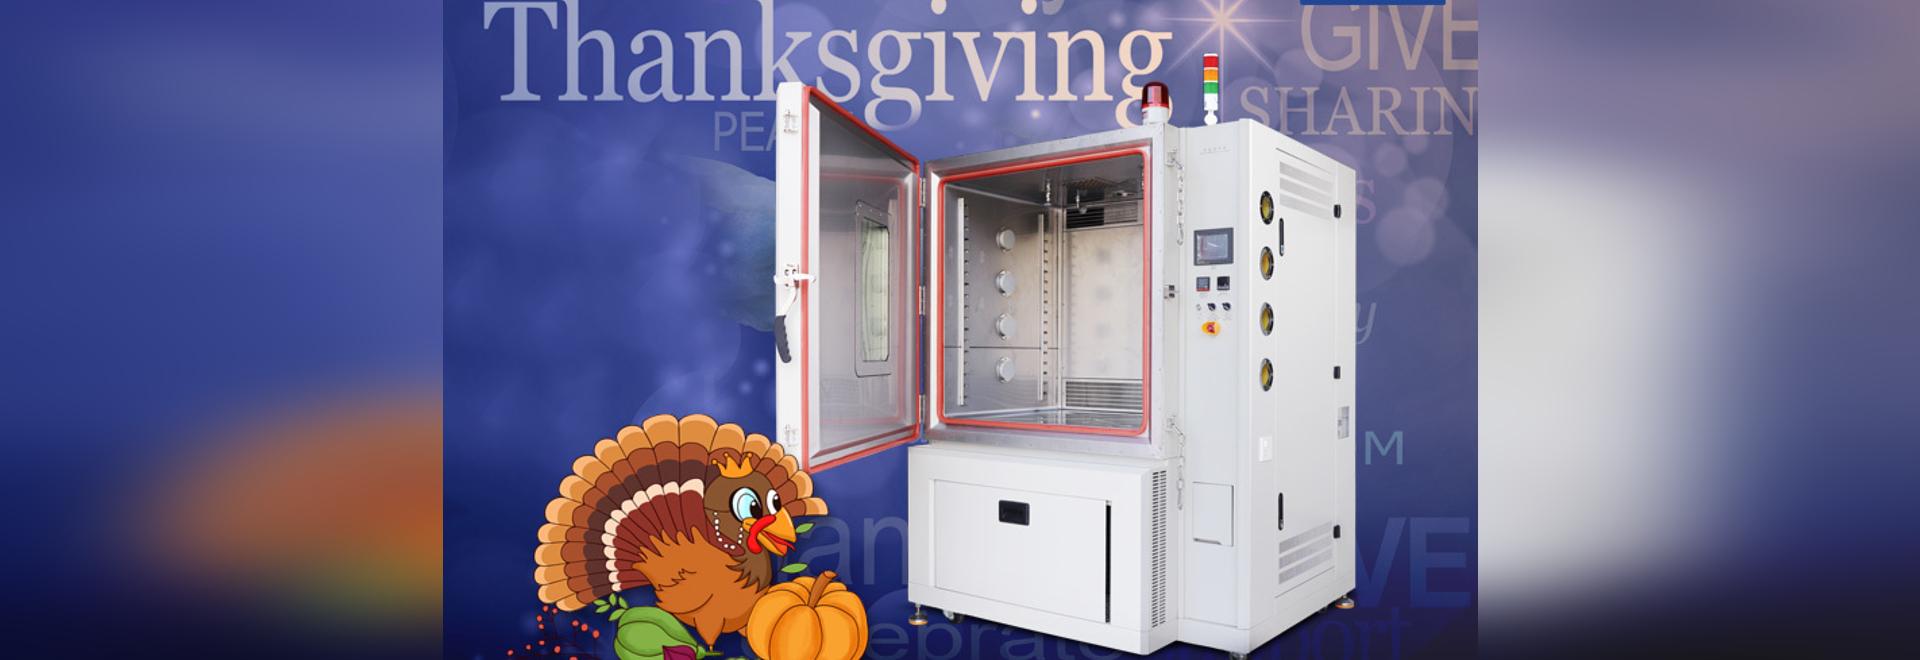 Jour de Thanksgiving 2020